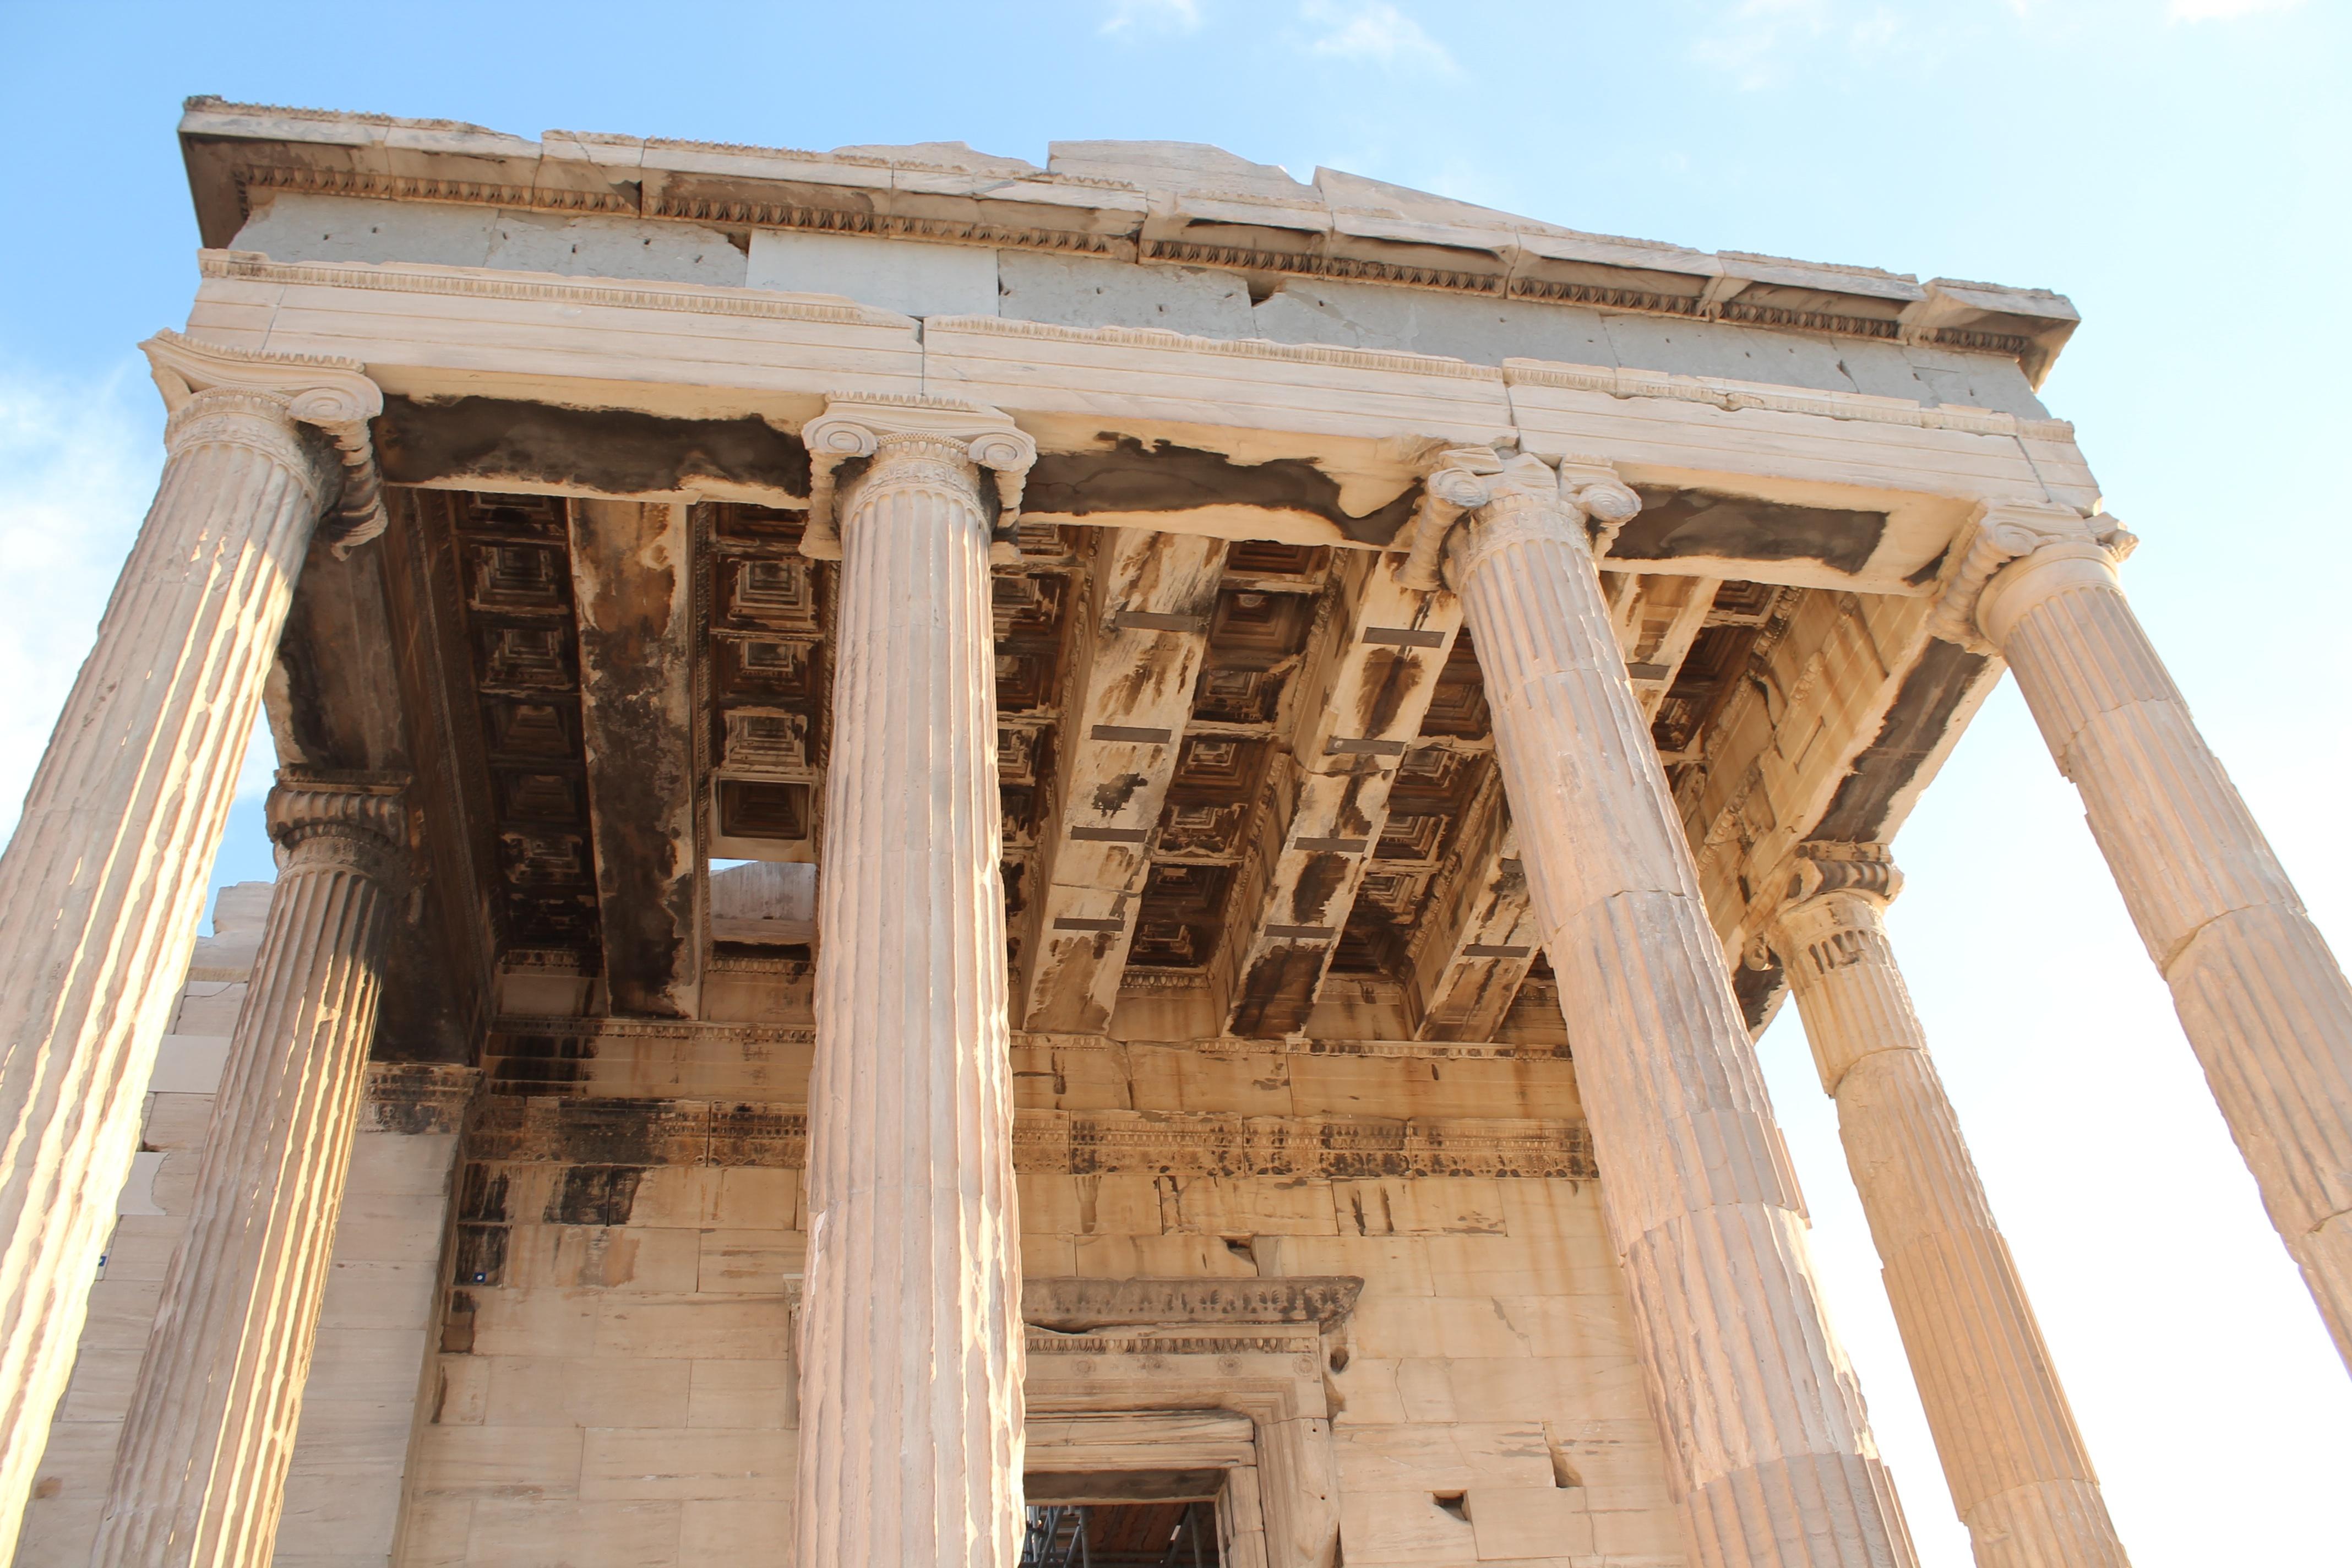 Fotos Gratis Estructura Madera Techo Haz Columna